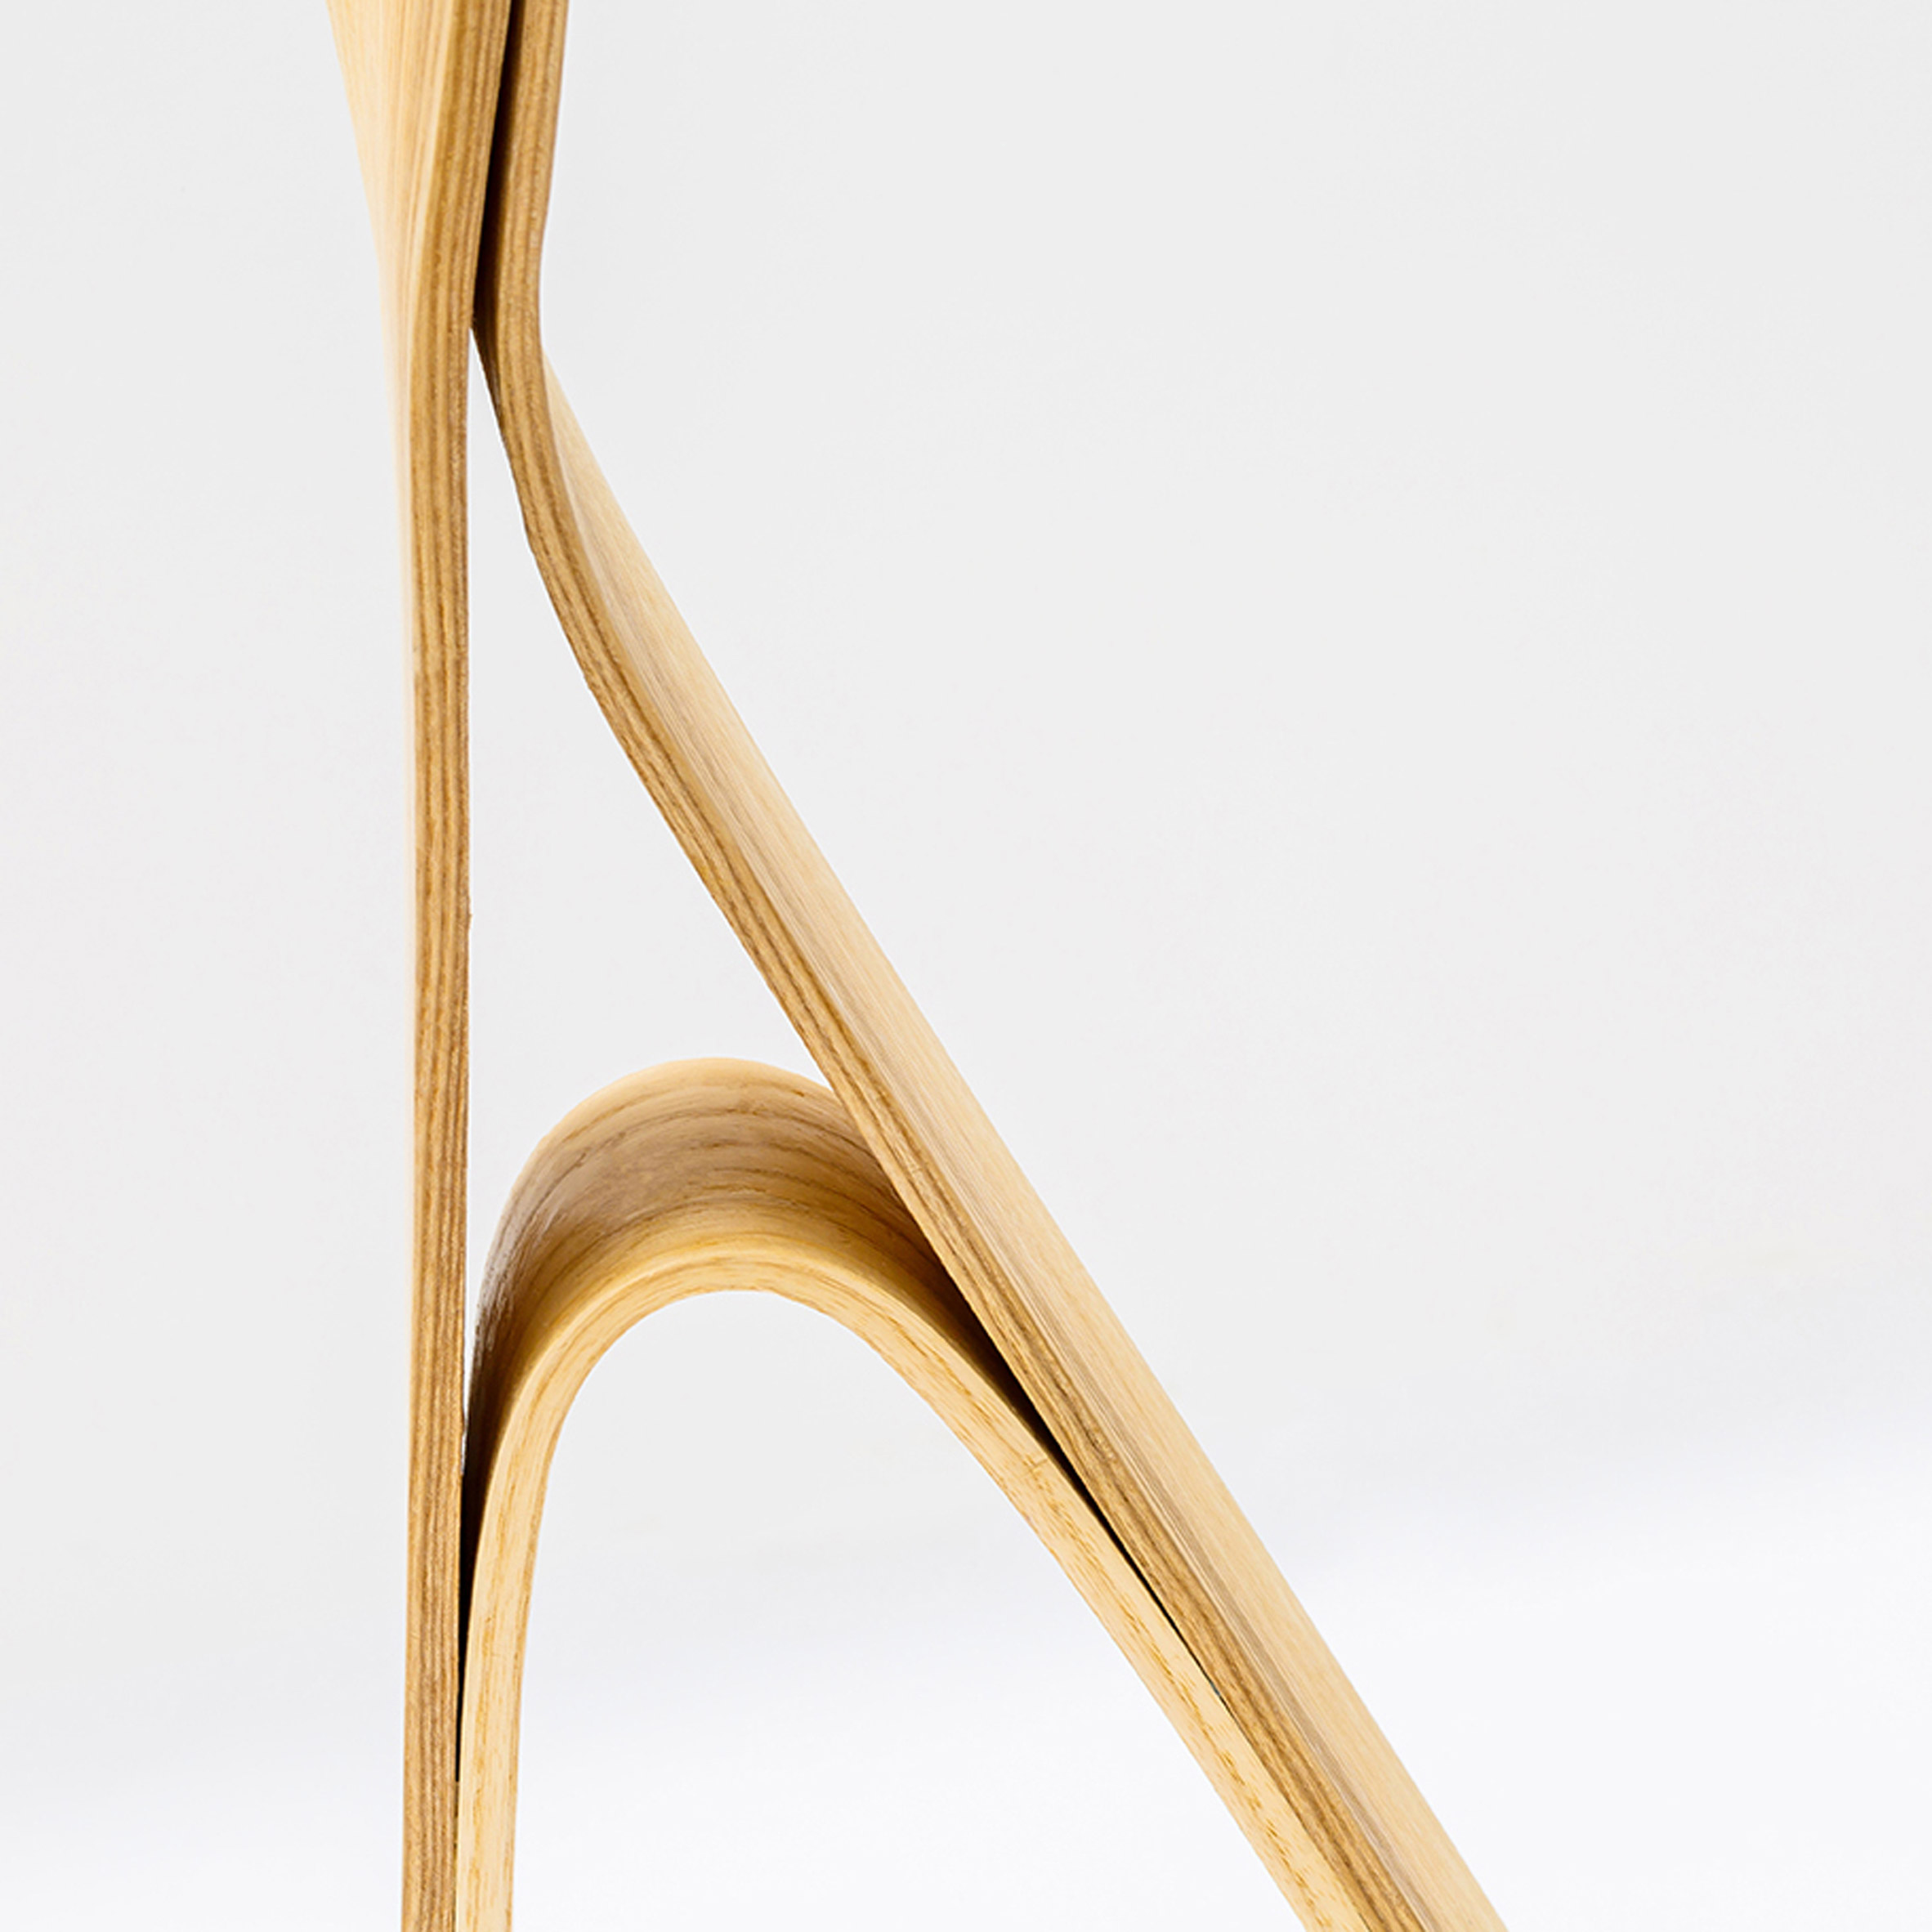 IMM  Steam bending furnitures. Bar Gantz uses steam bending to create twisted wood furniture